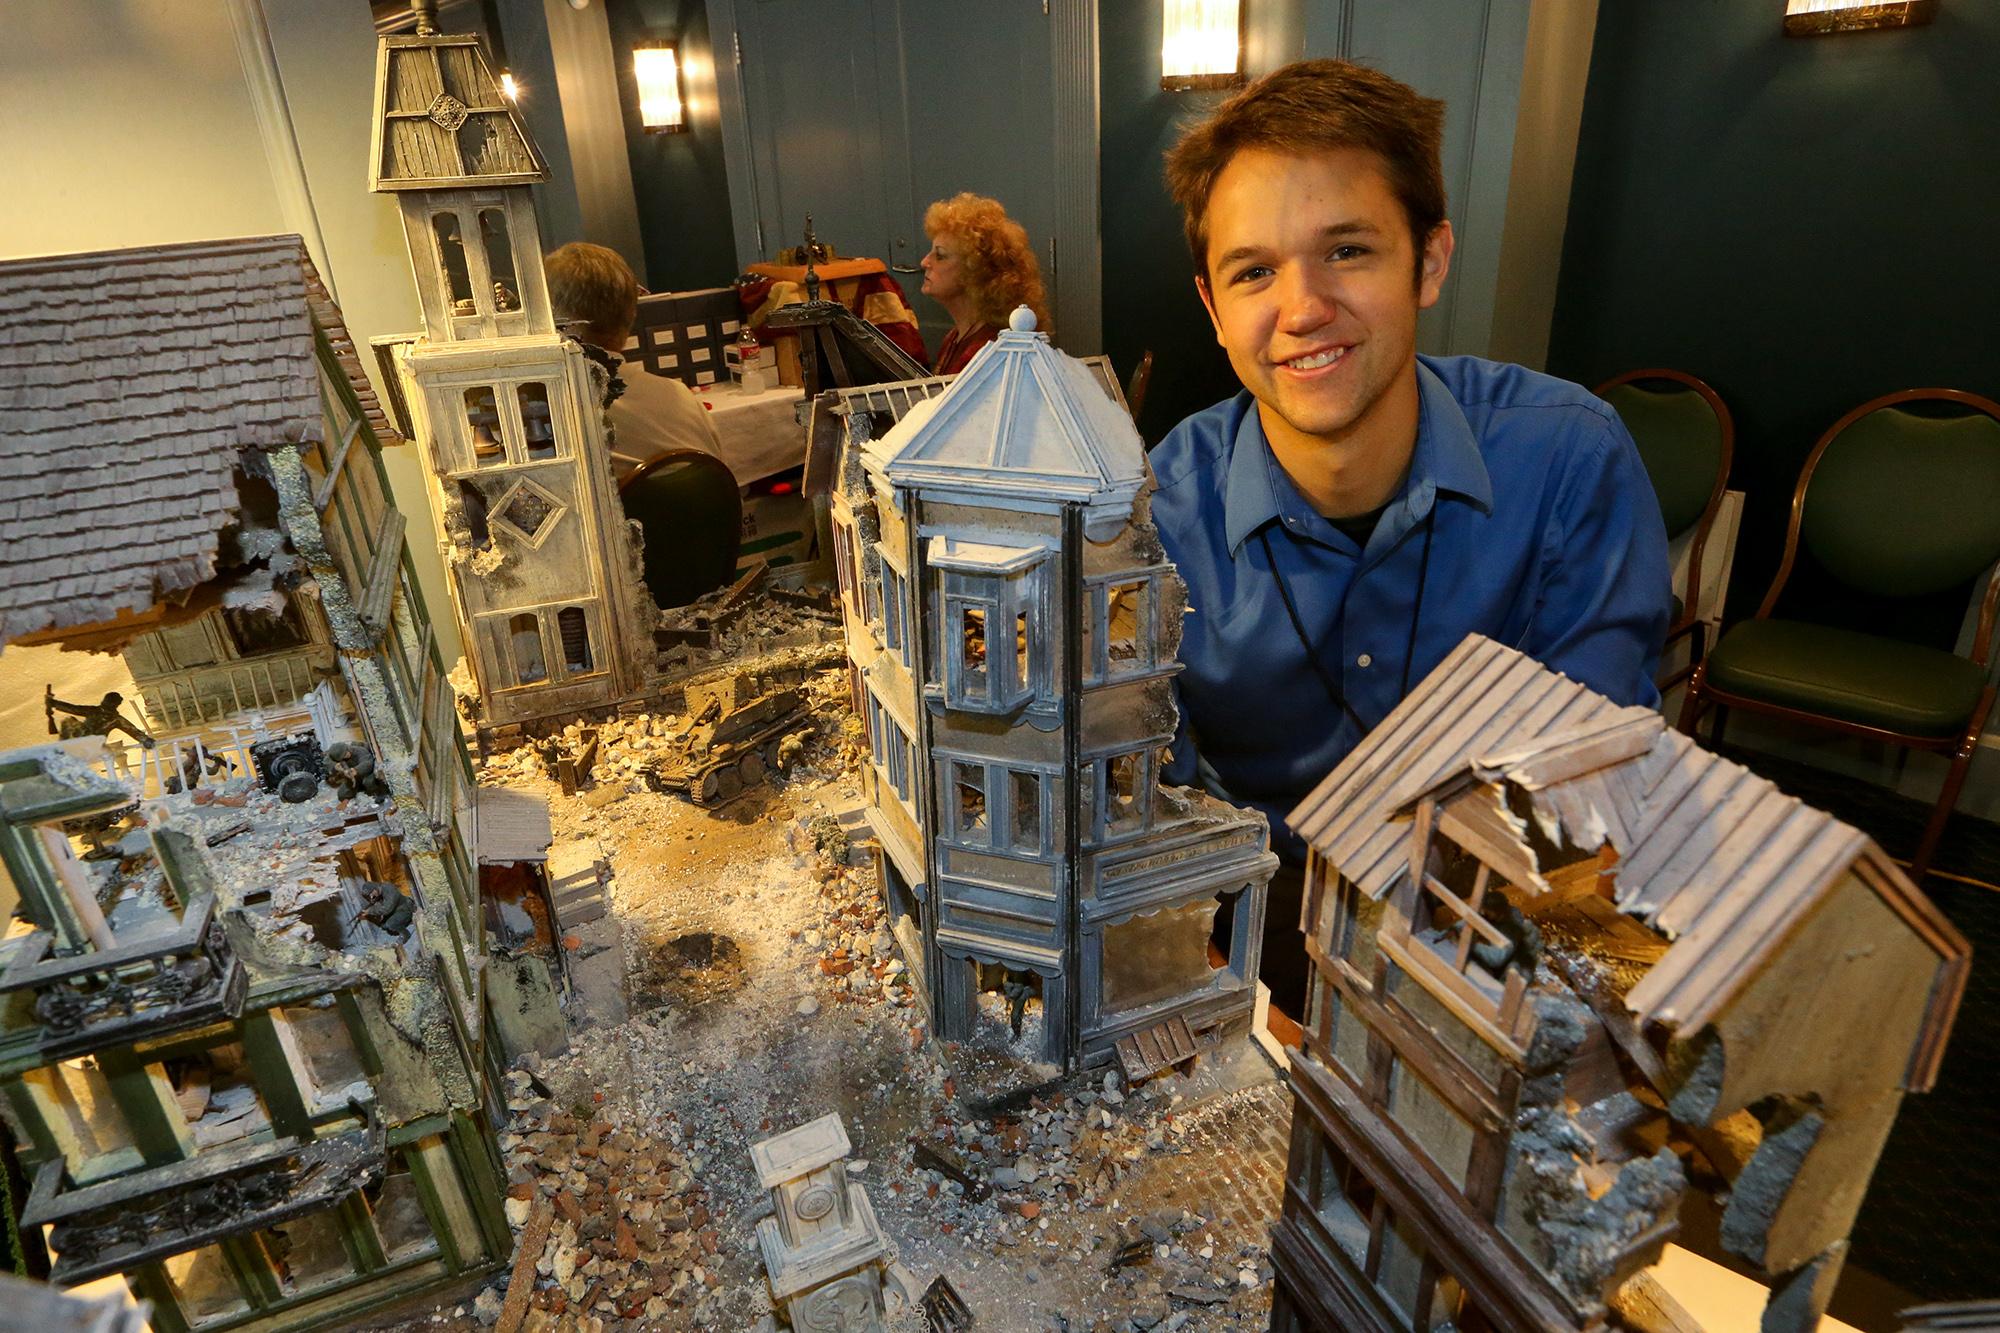 Tiny Toy Soldiers Can Make Big Impression San Antonio